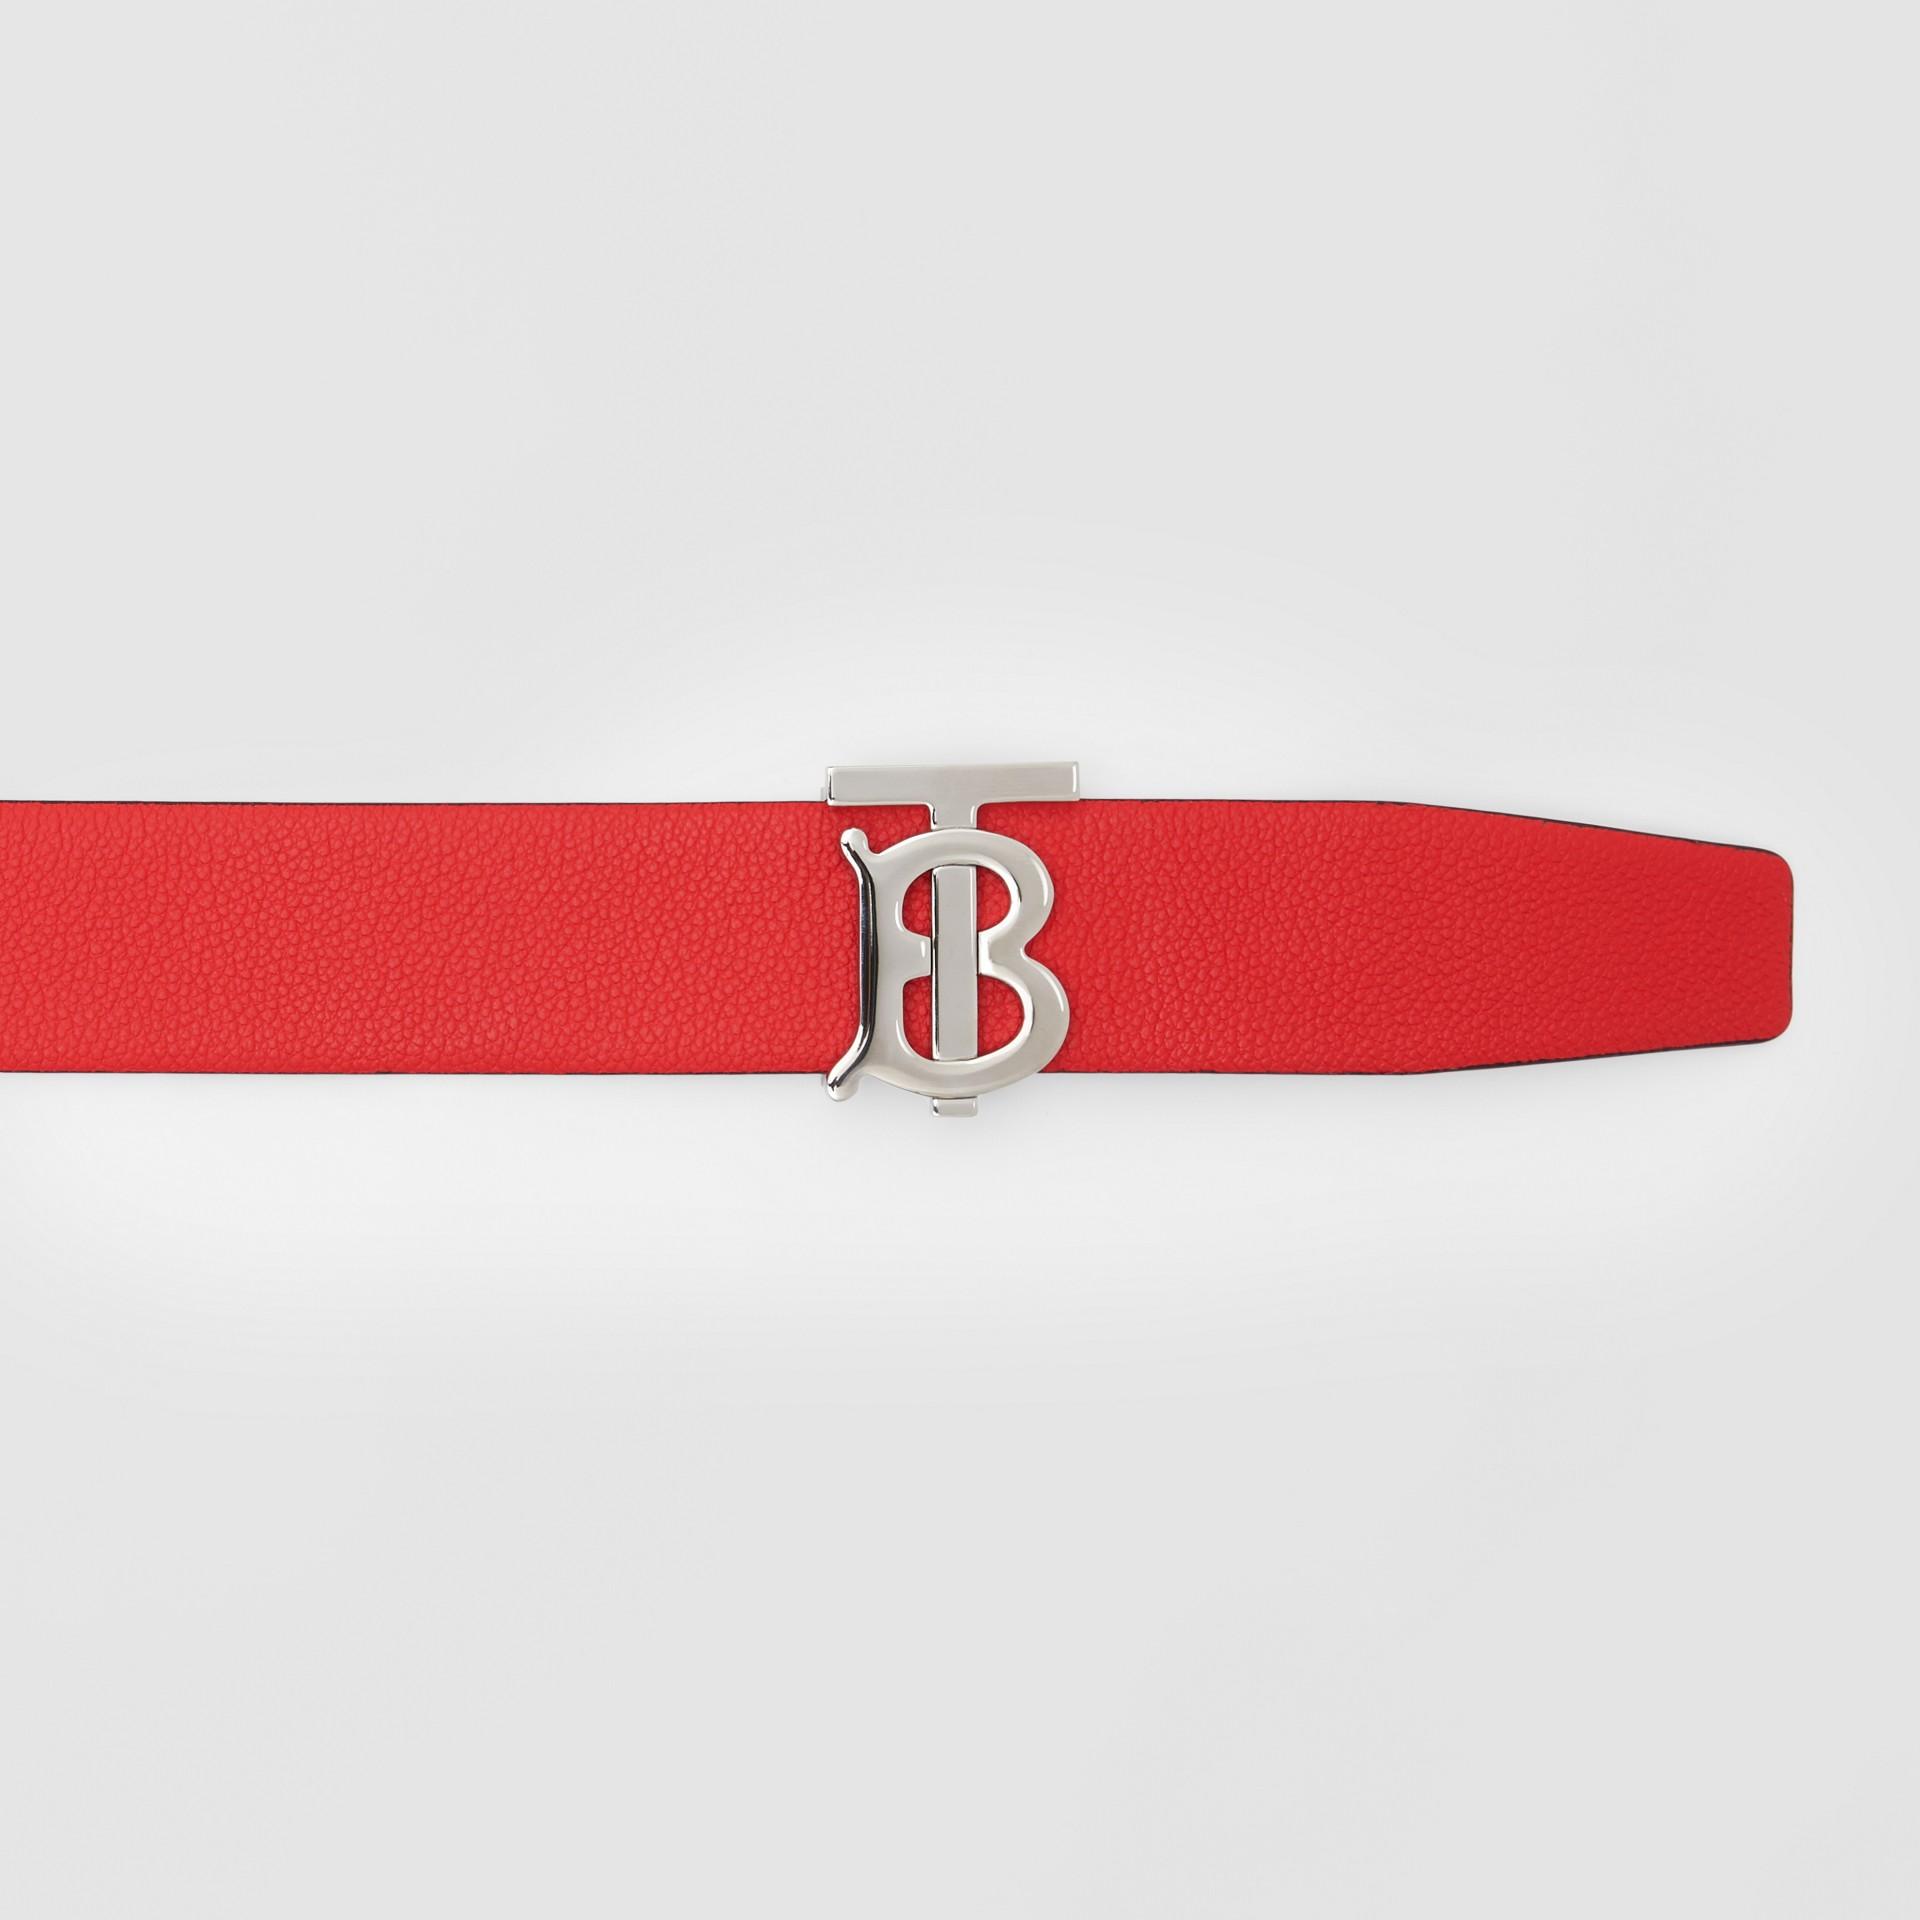 Reversible Monogram Motif Grainy Leather Belt in Military Red/black - Men | Burberry United Kingdom - gallery image 1